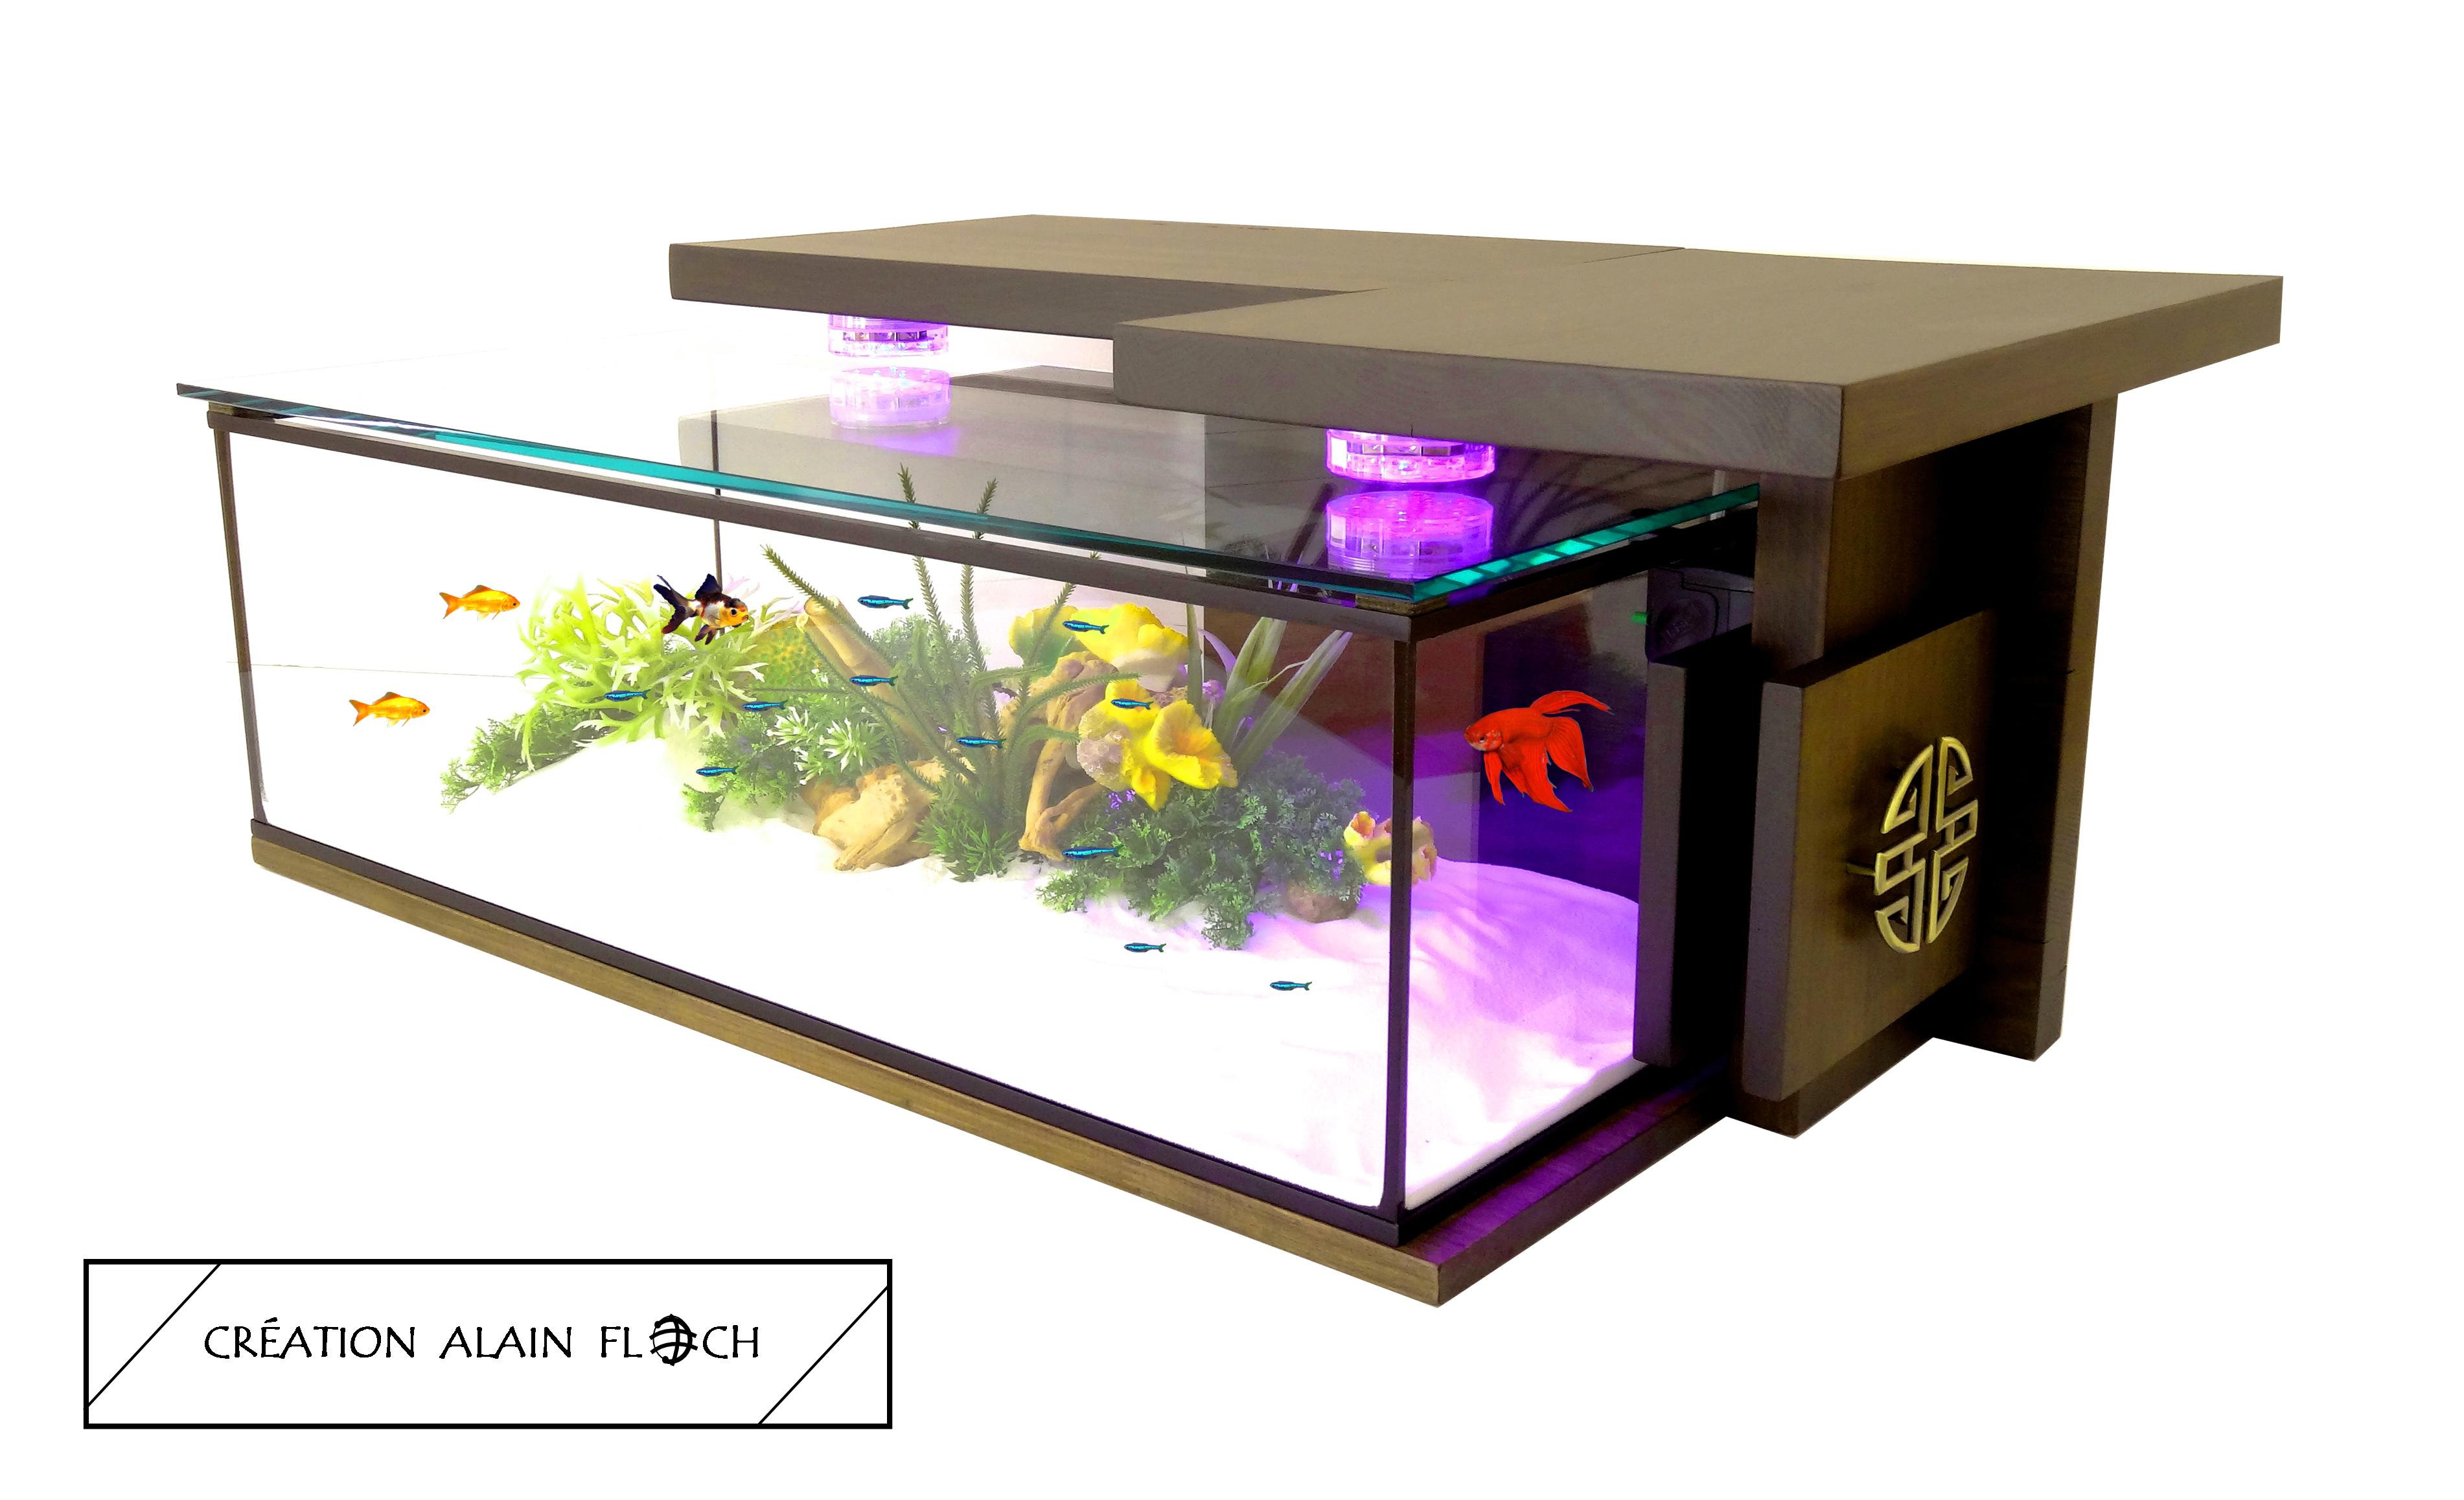 chaussures de sport dfc53 99edd Table basse aquarium MONASTIK 20 LED + Filtre interne design